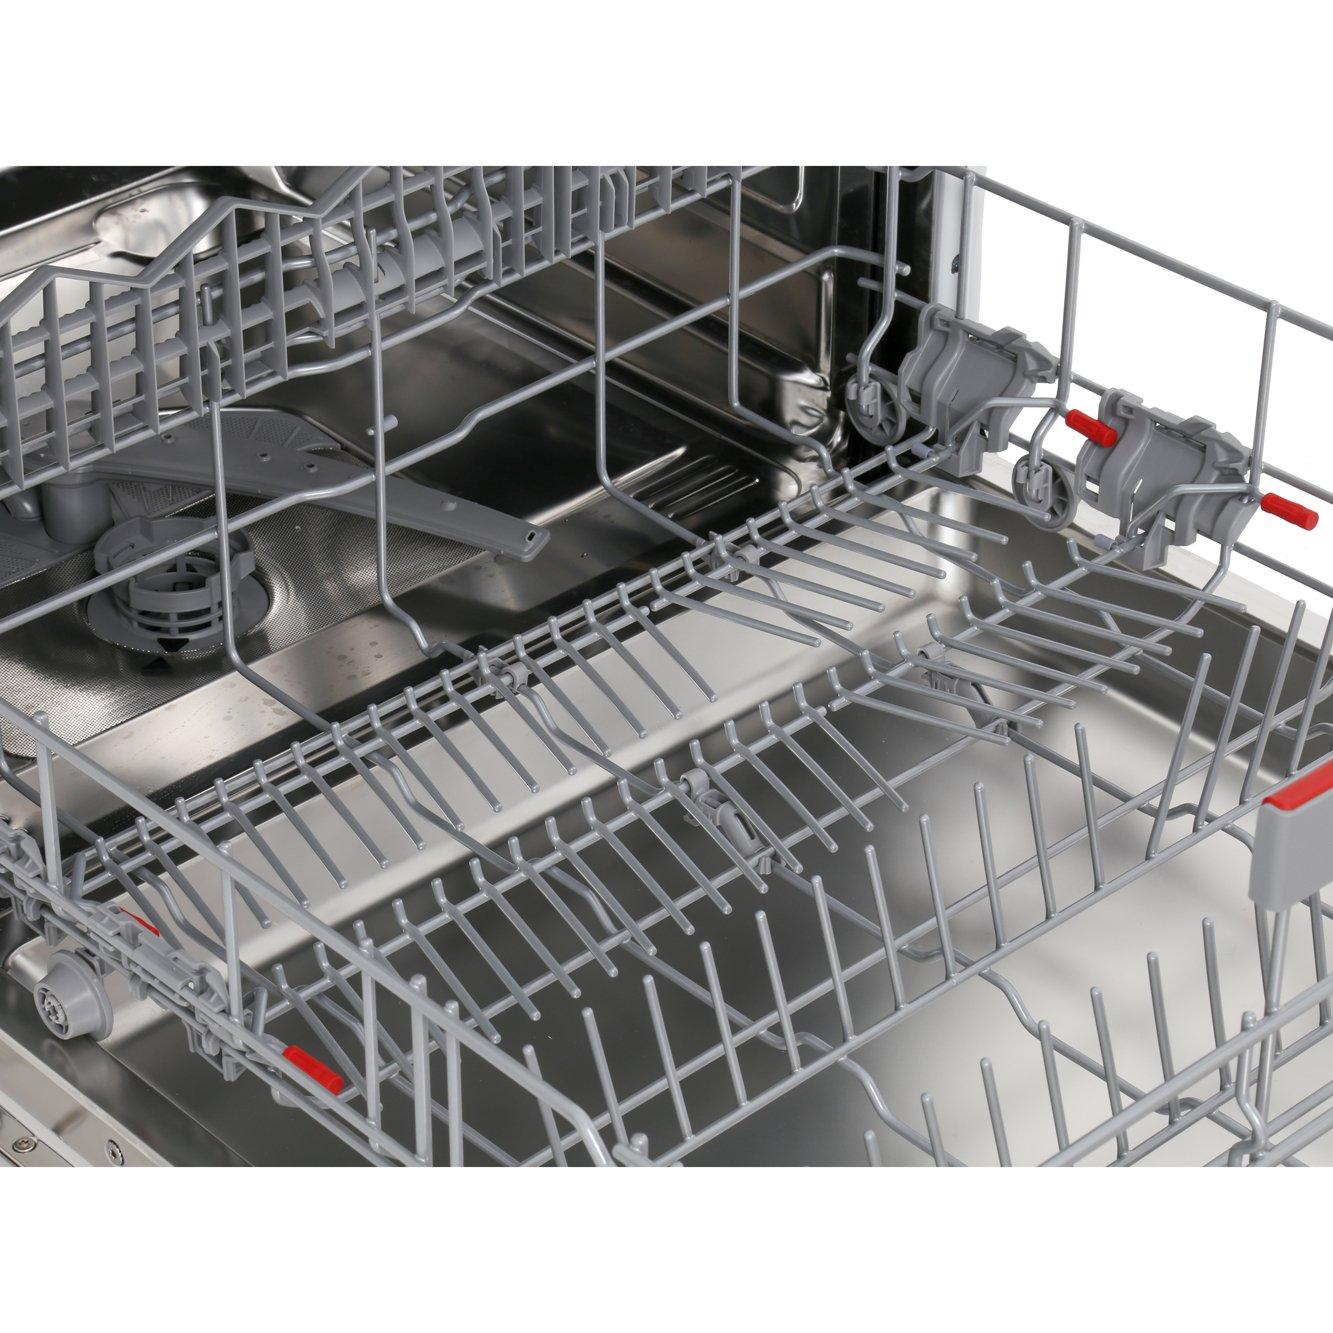 Buy Bosch Smv68md01g Built In Fully Integrated Dishwasher